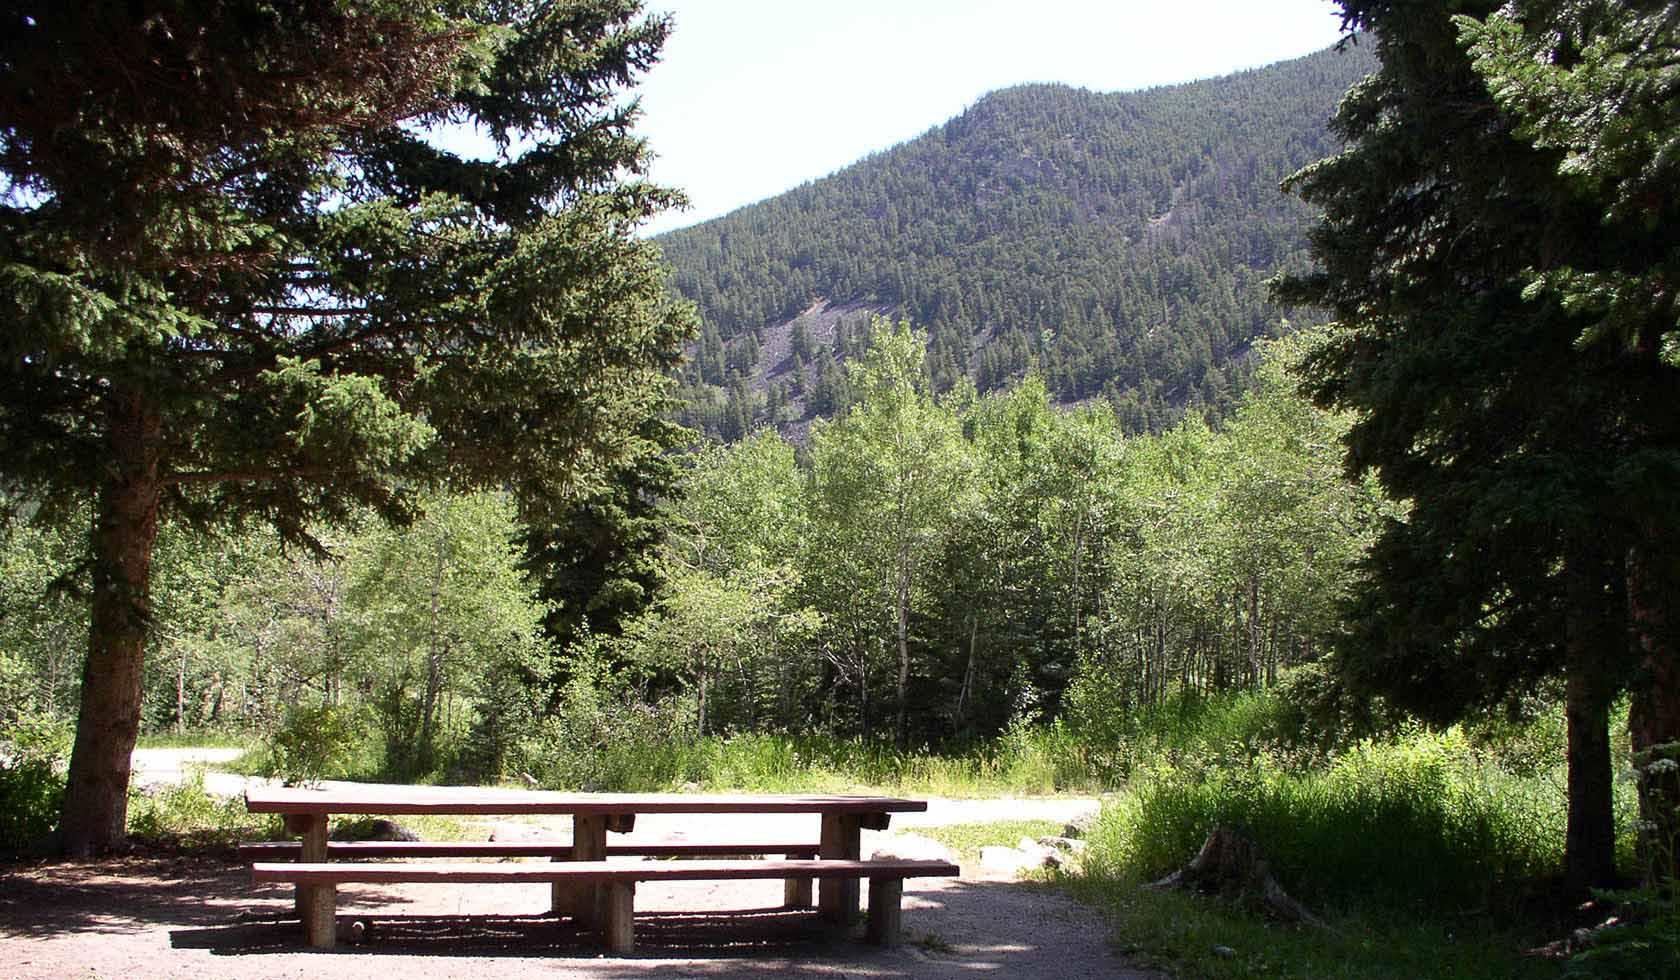 Rattin Campground profile image